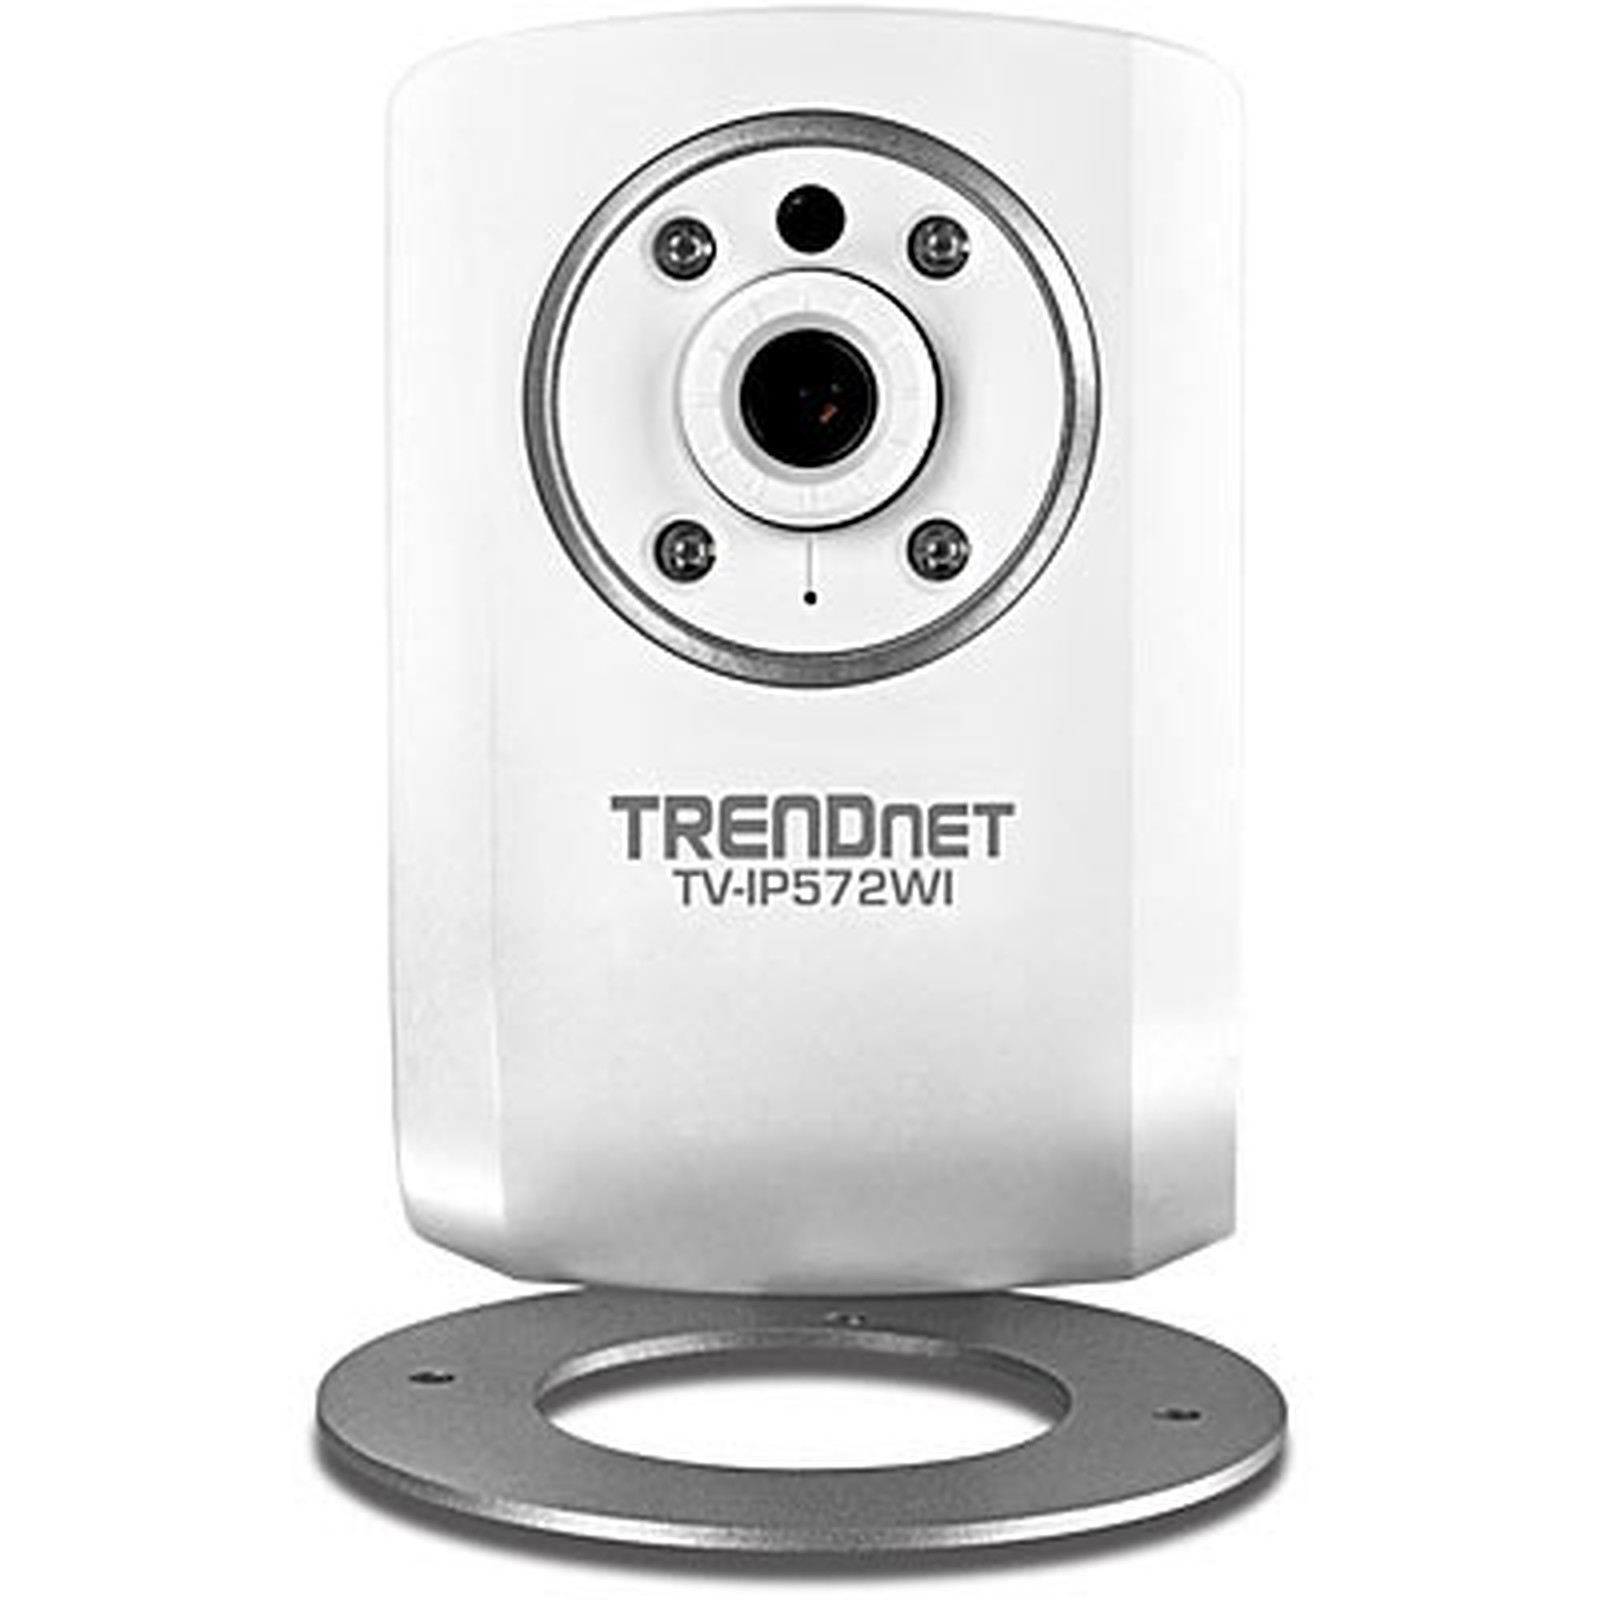 TRENDnet TV-IP572WI